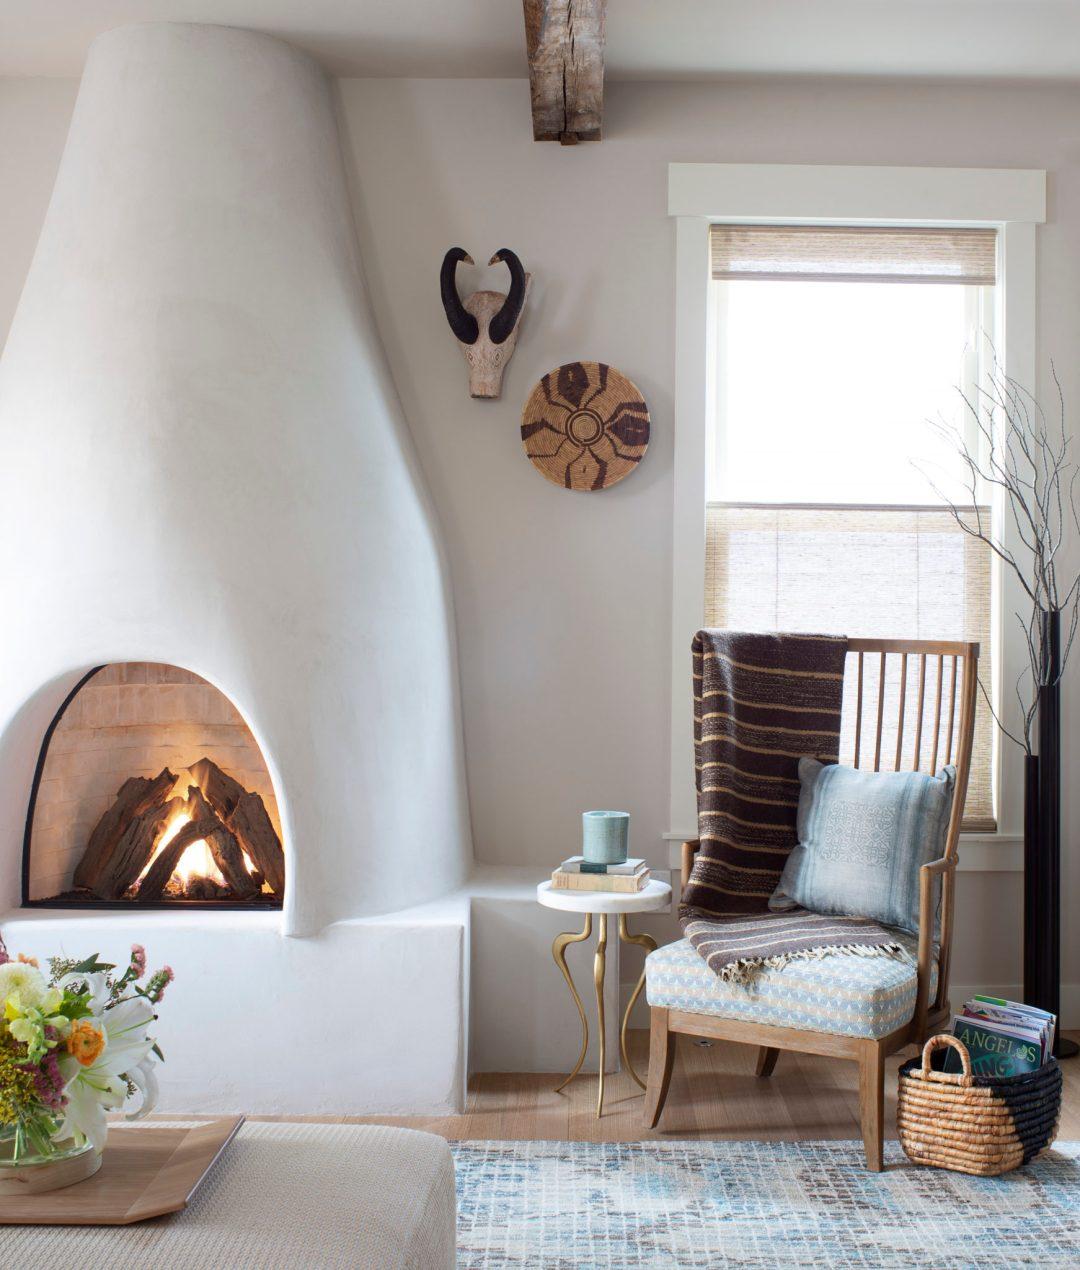 Julee, familyroom., fireplace